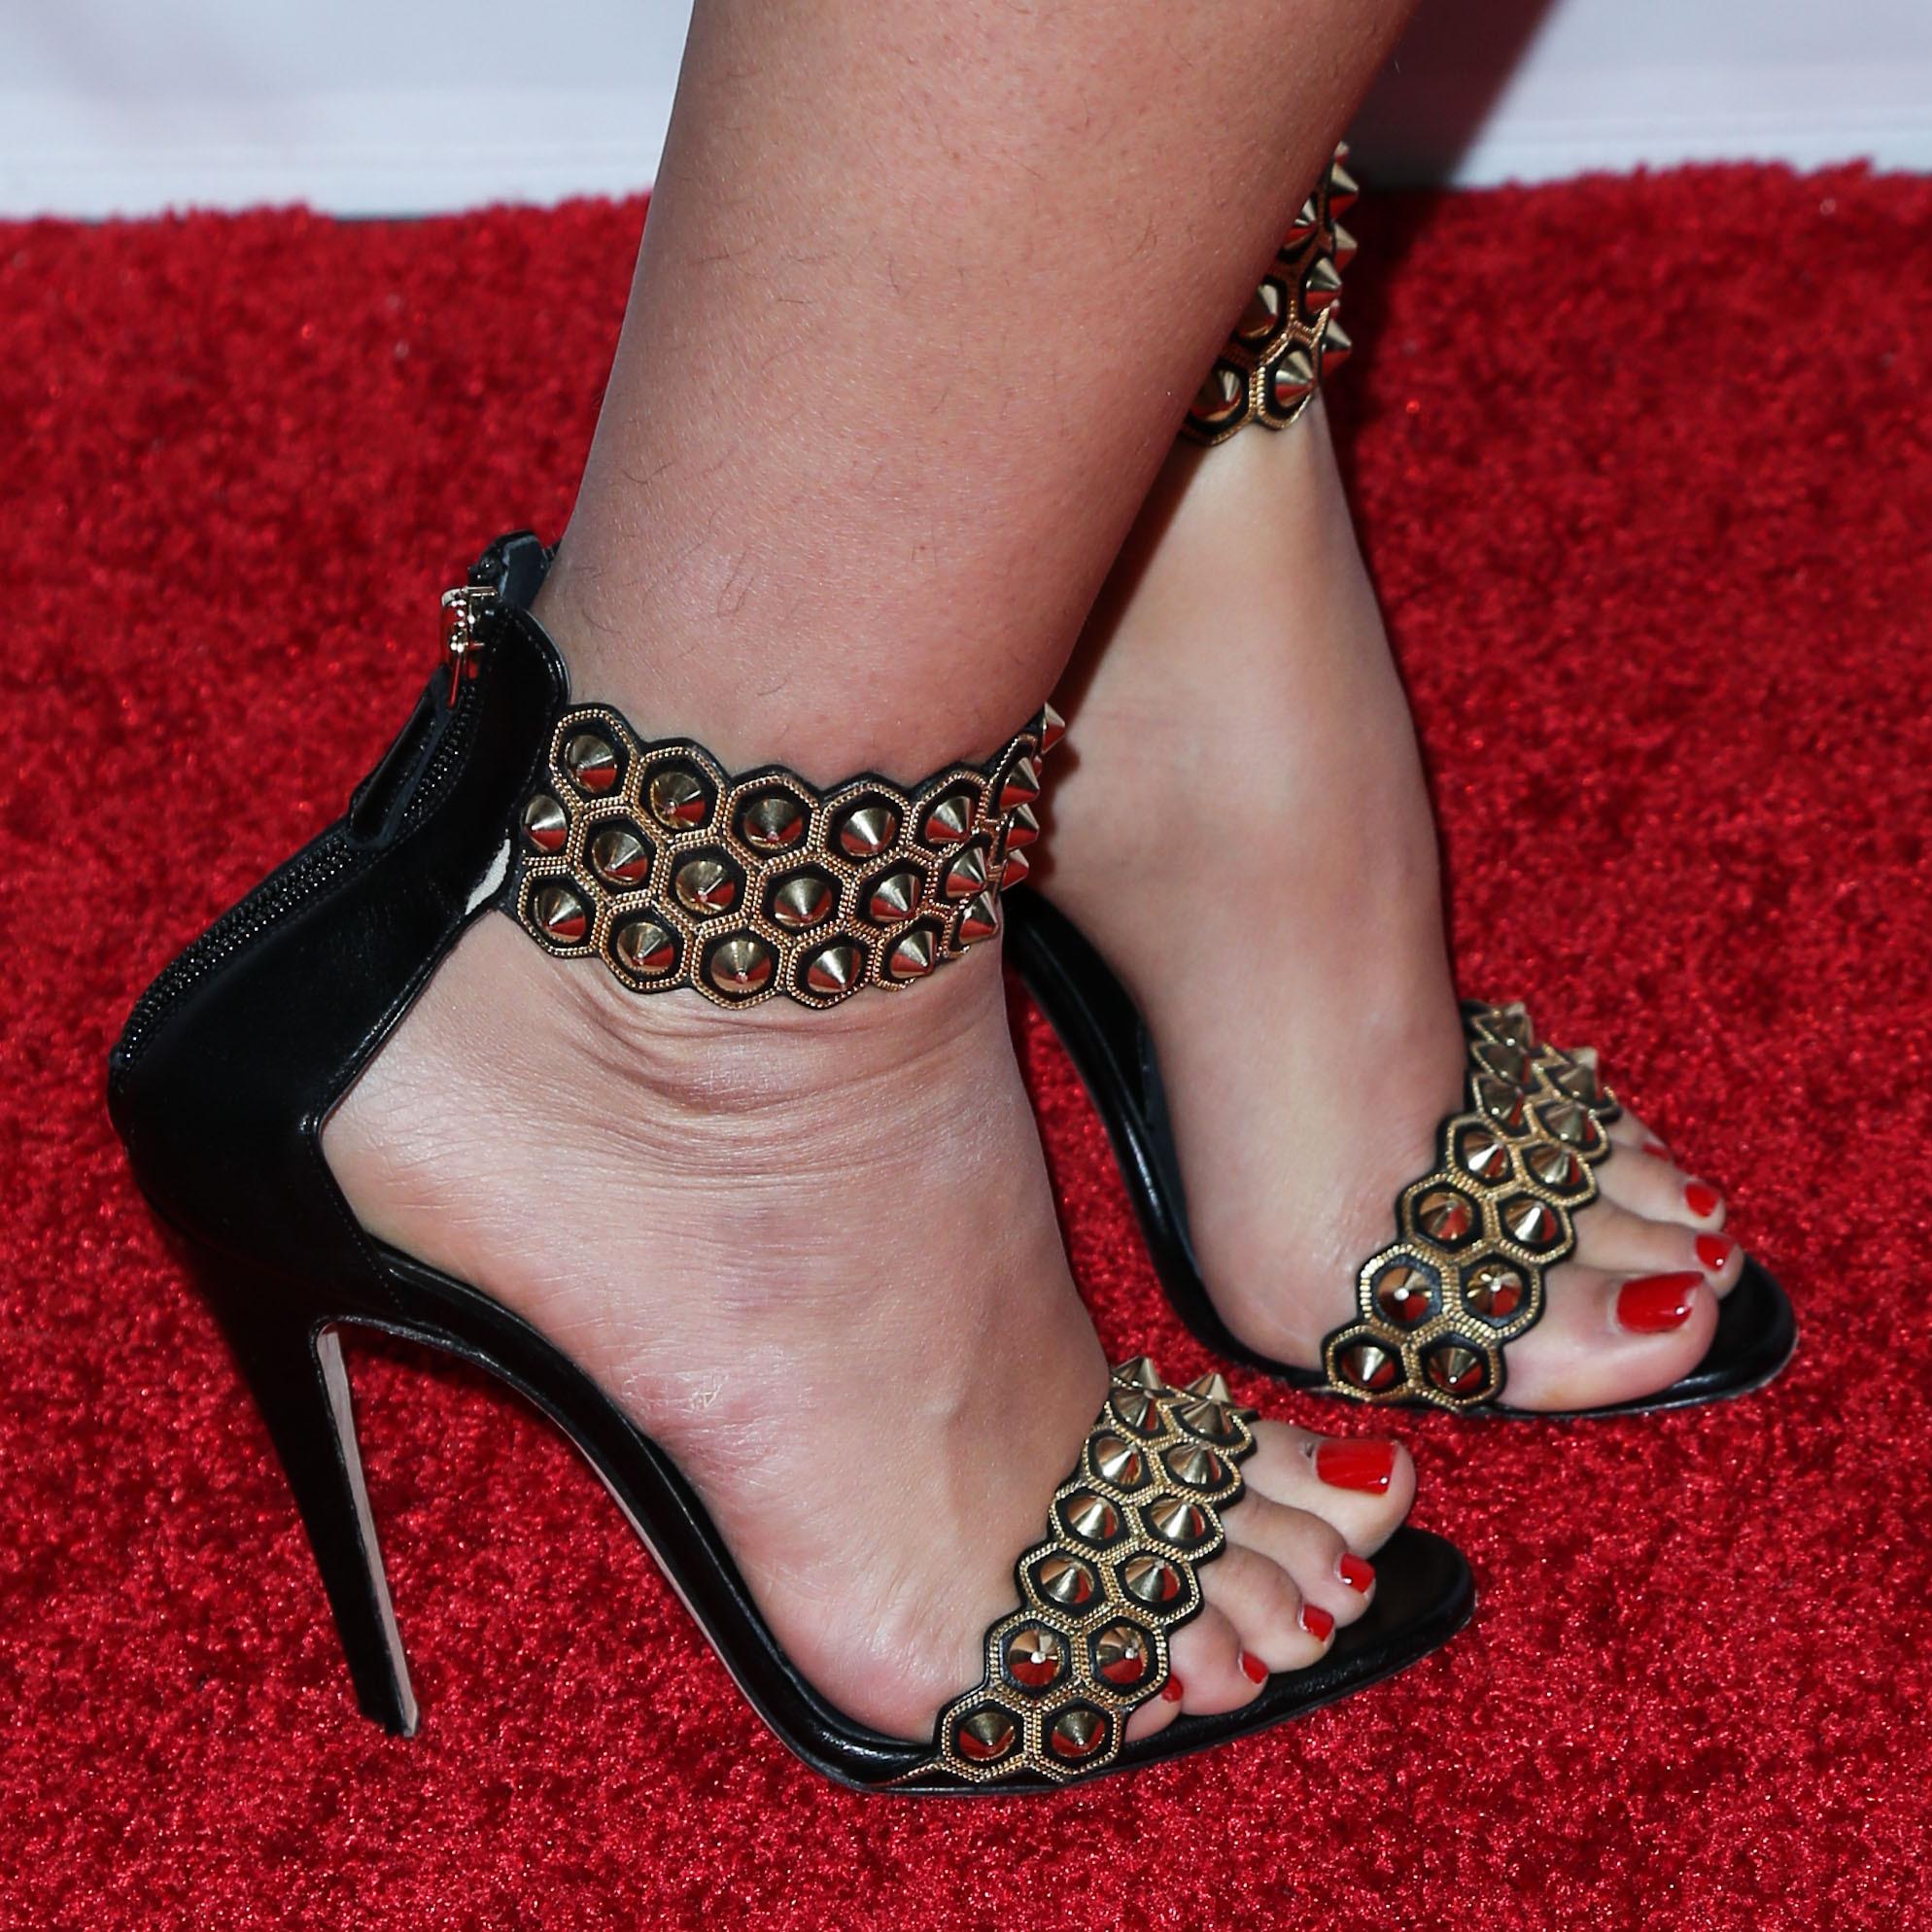 Tammin Sursoks Feet